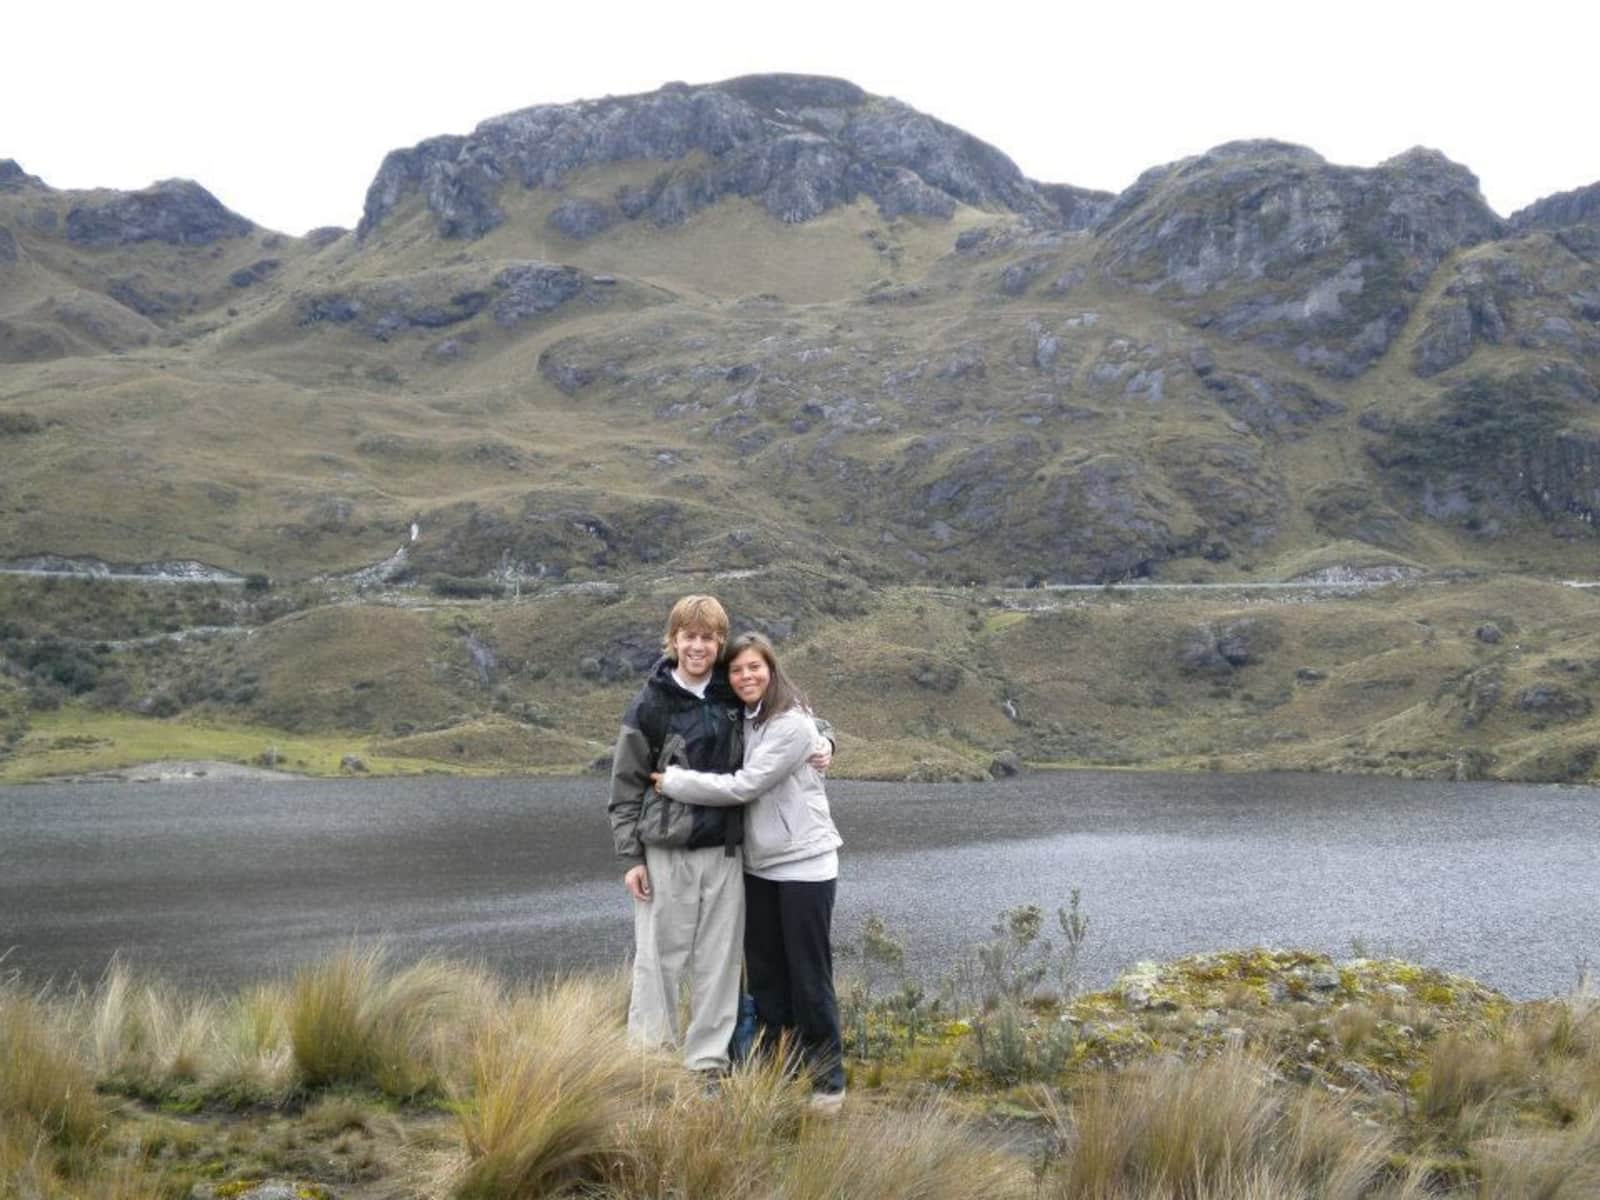 Mariana & Miguel from La Plata, Argentina